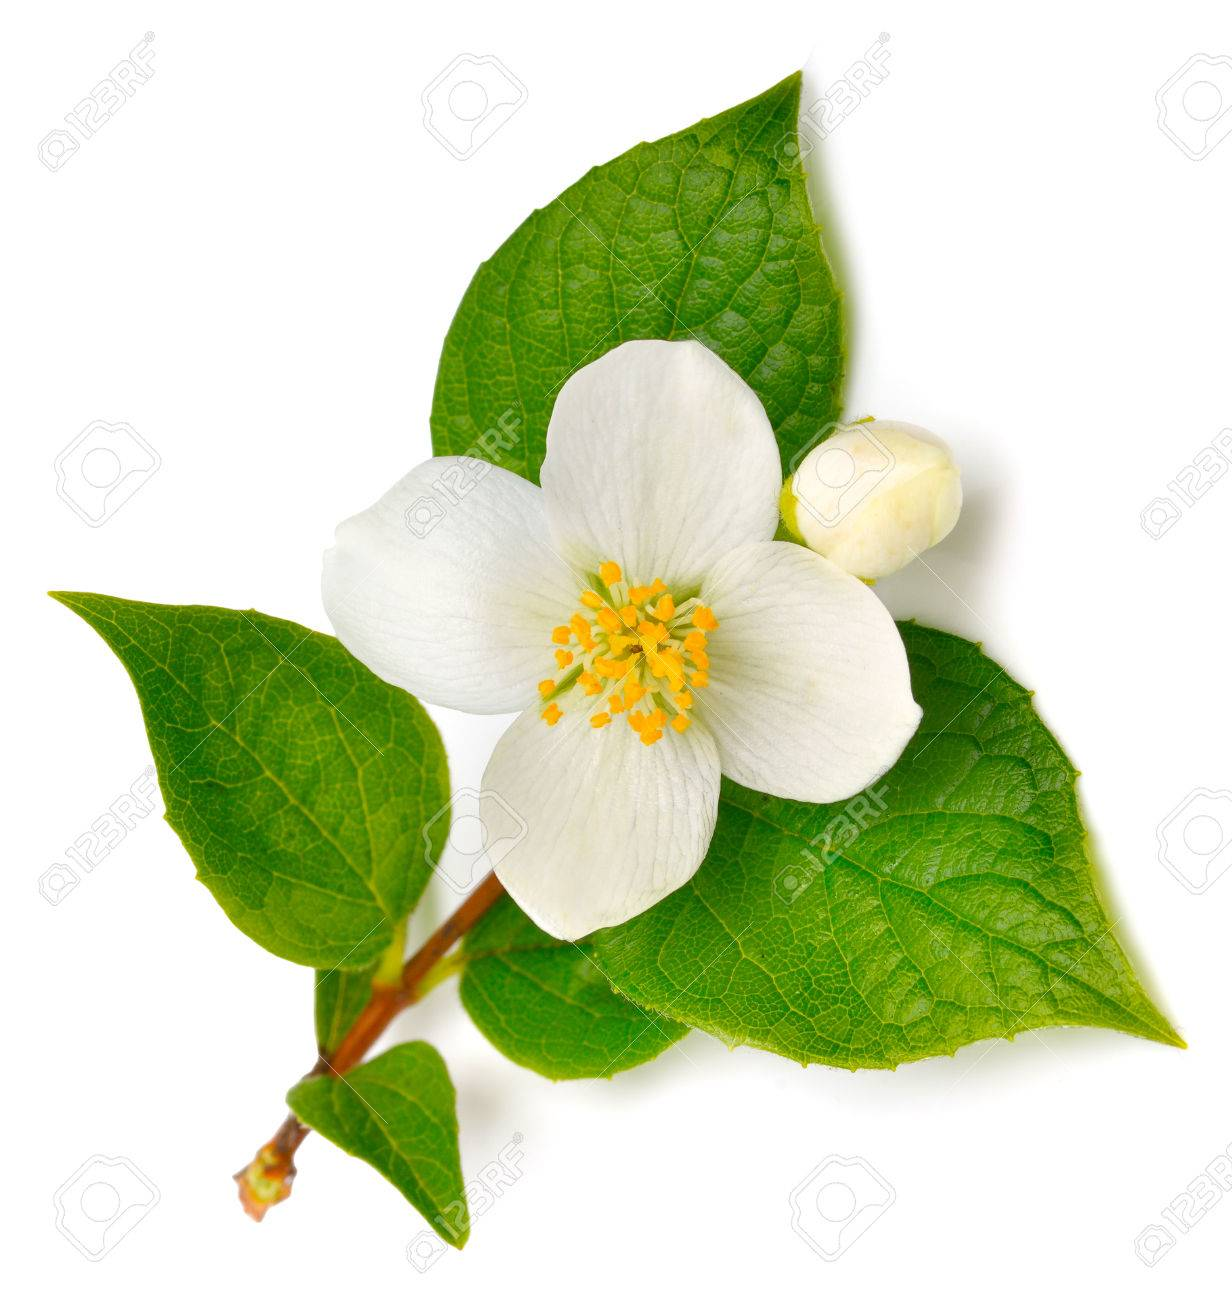 Jasmine flower isolated on white - 38430349